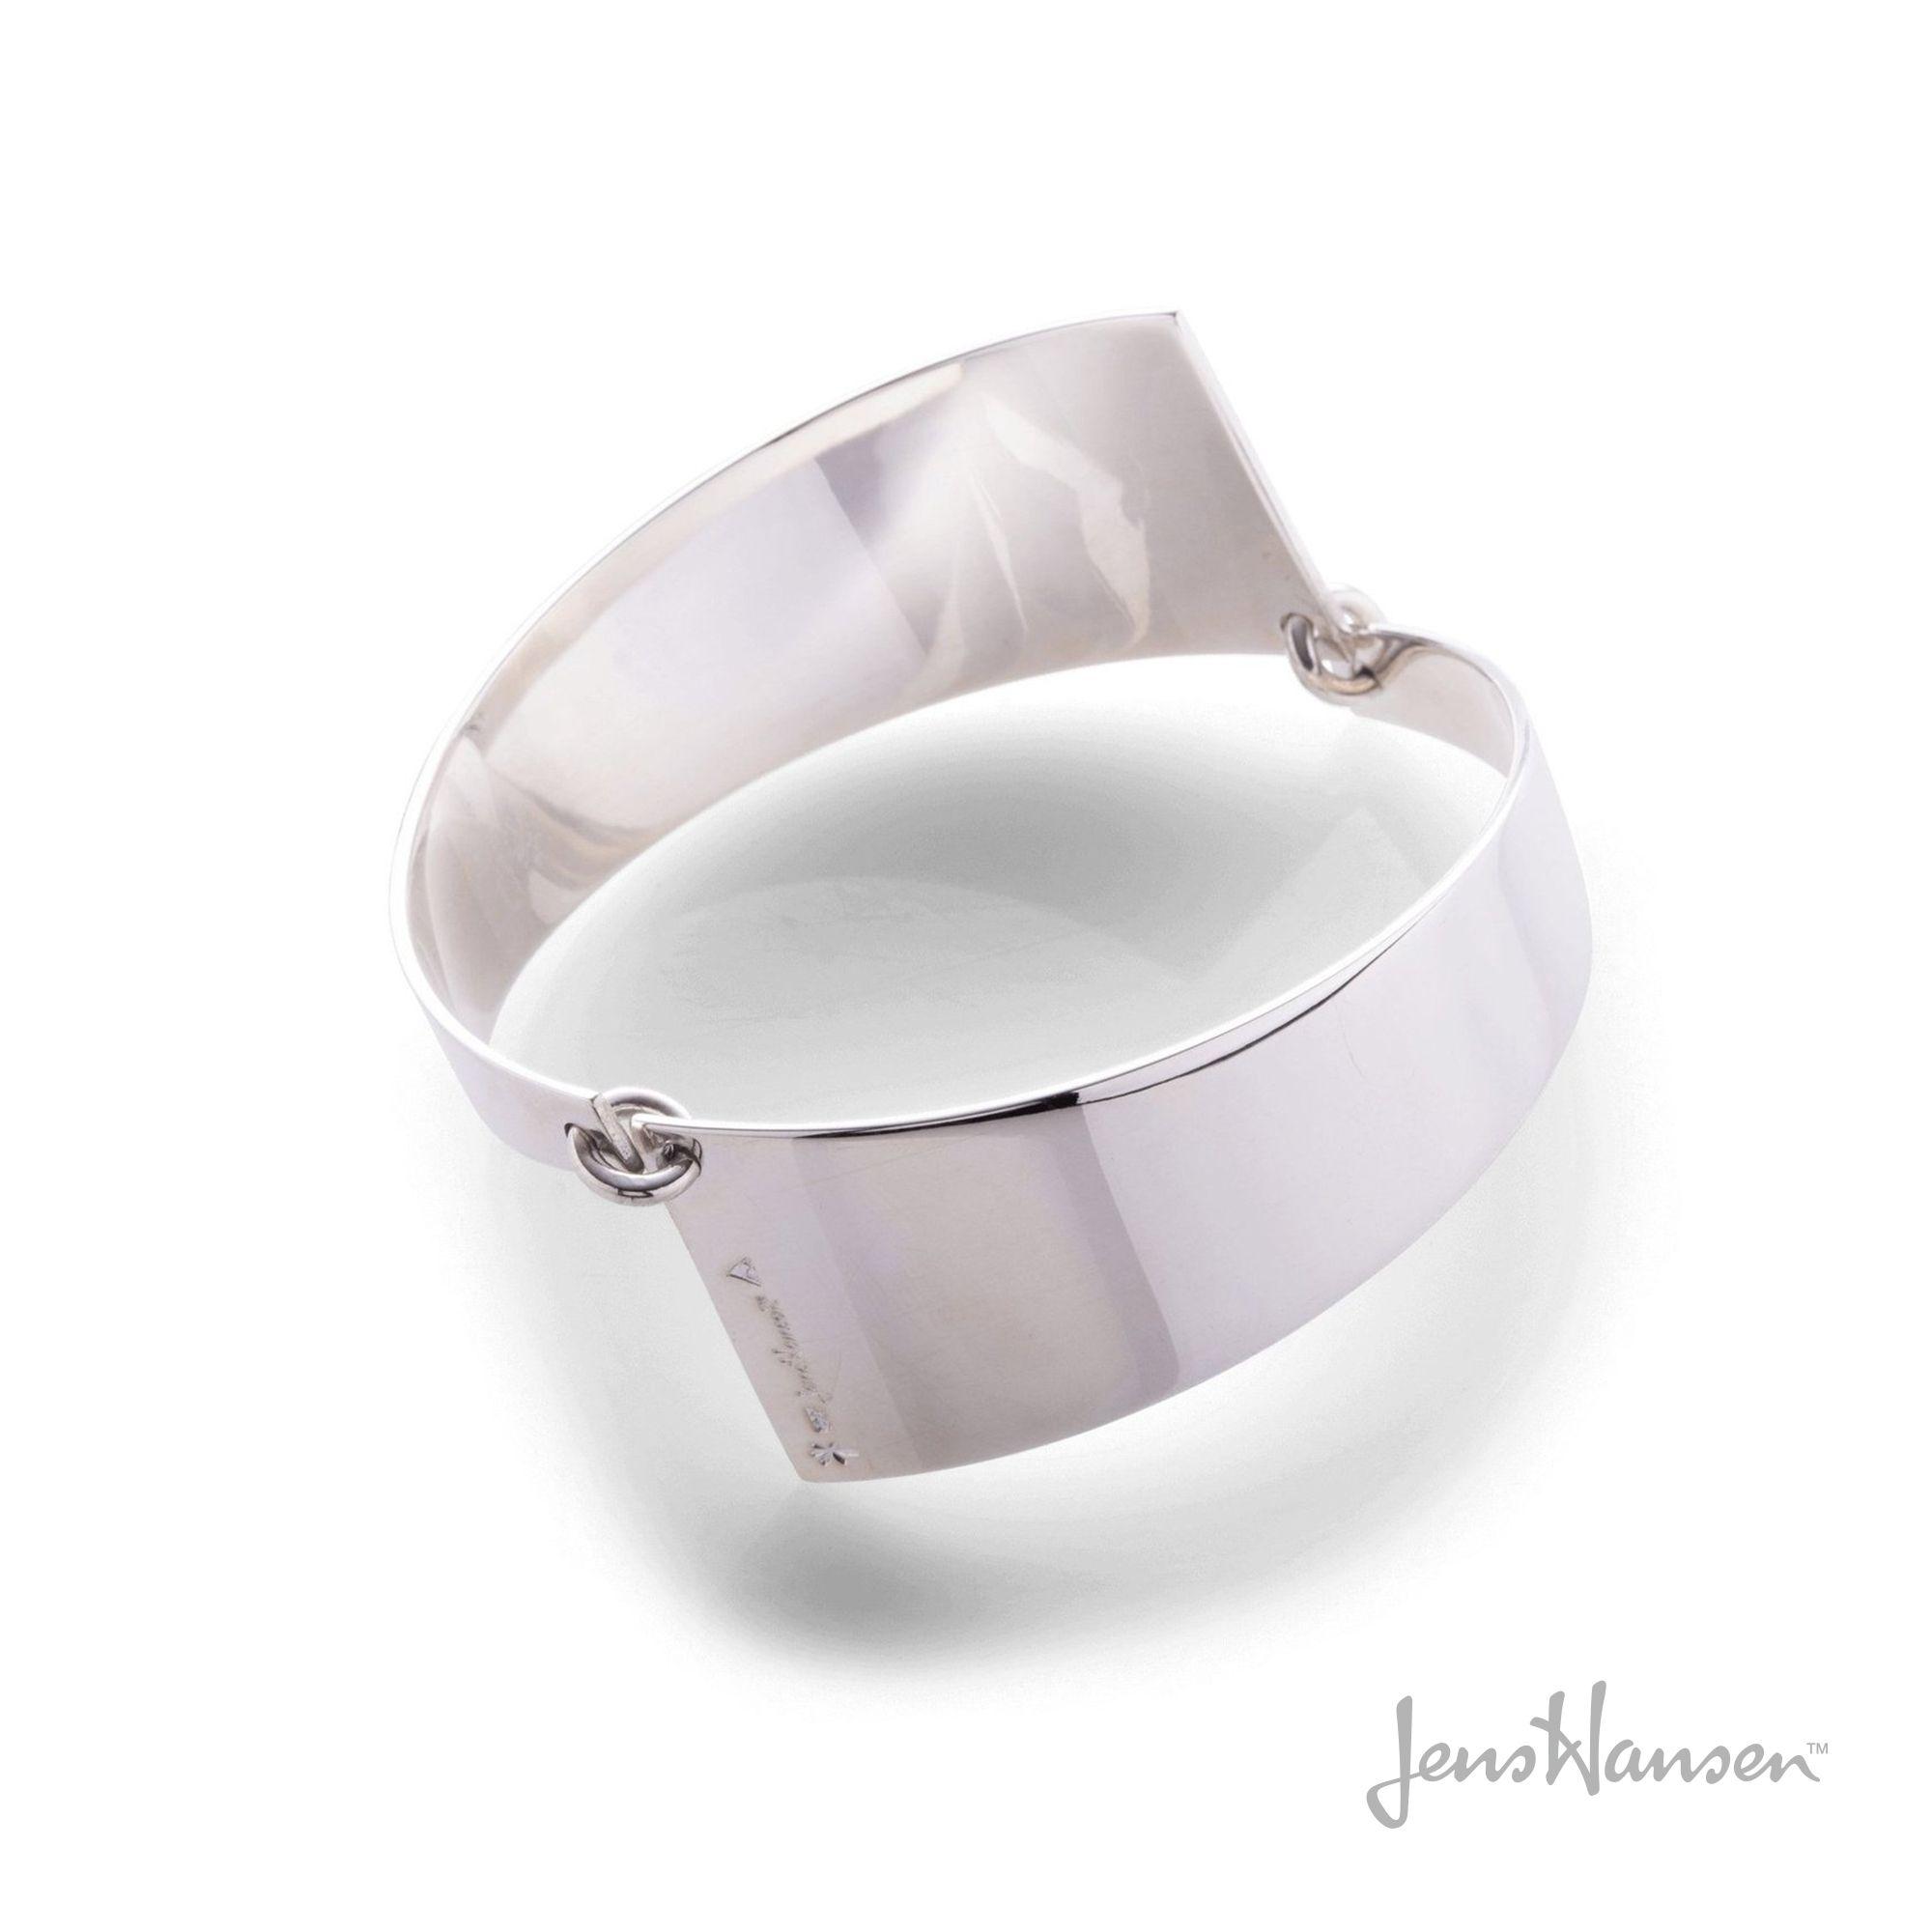 jens hansen legacy sails bracelet legacy collection jens